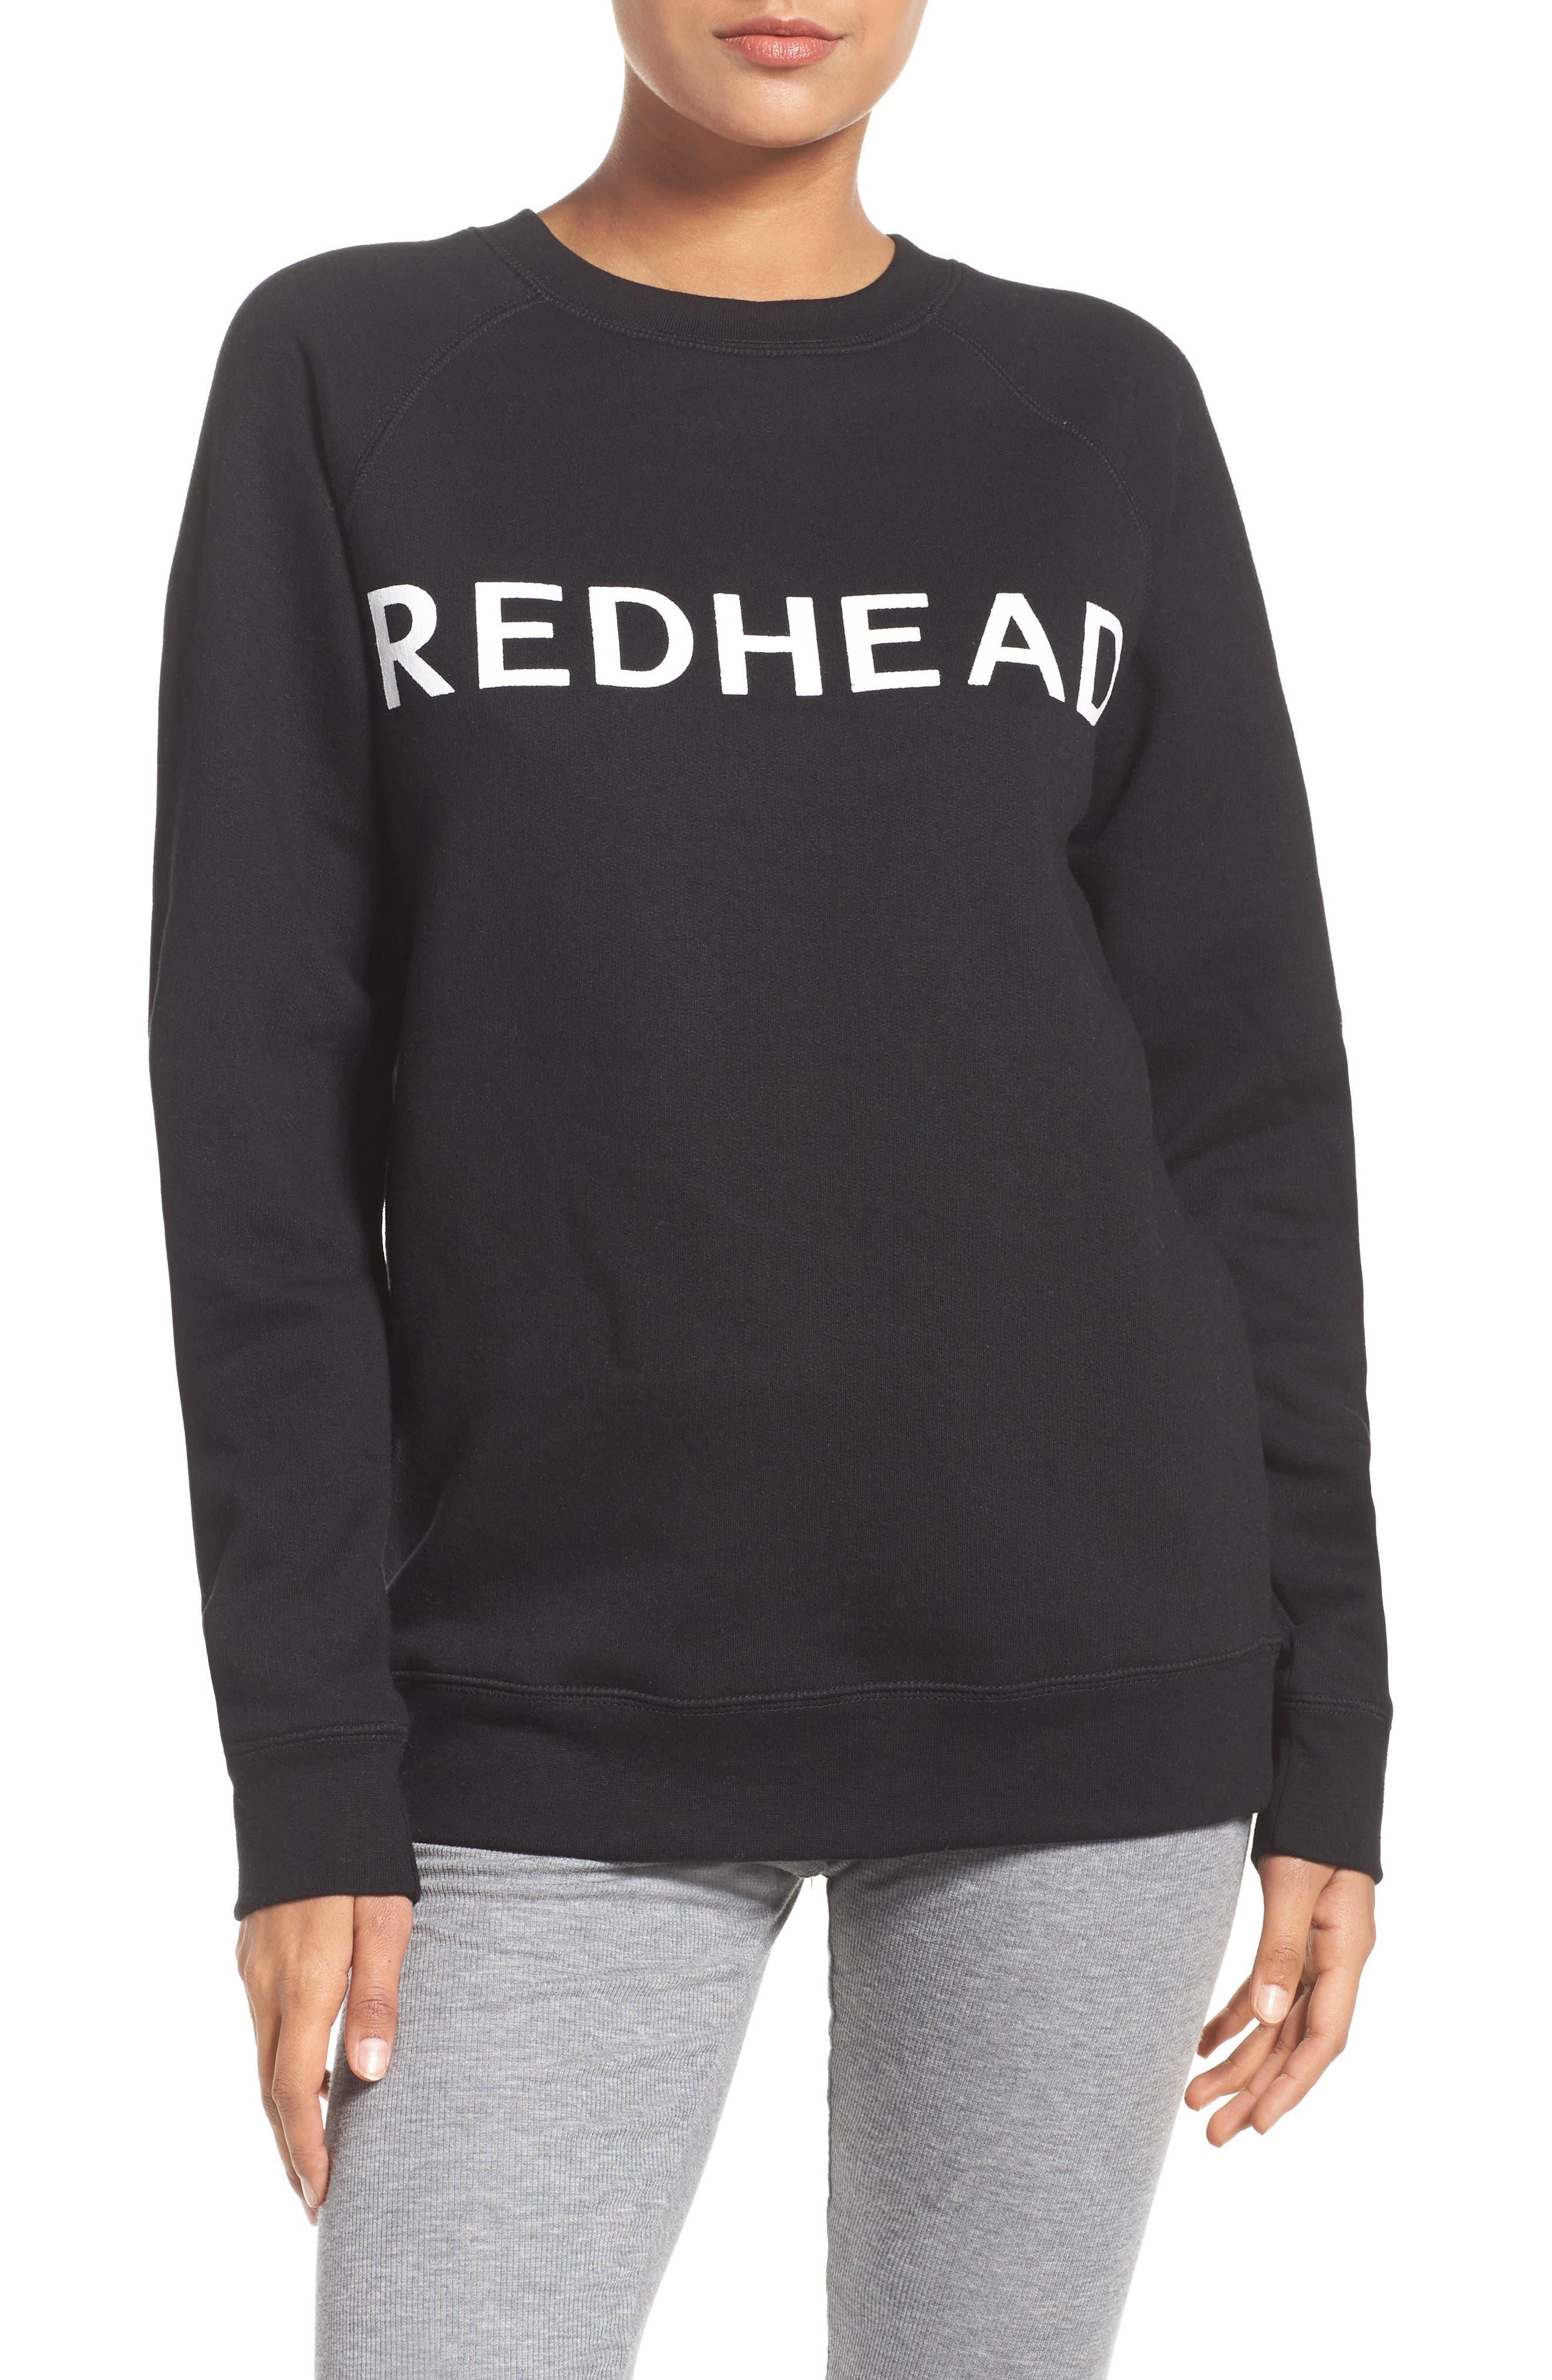 Redhead Lounge Sweatshirt,                         Main,                         color, 001